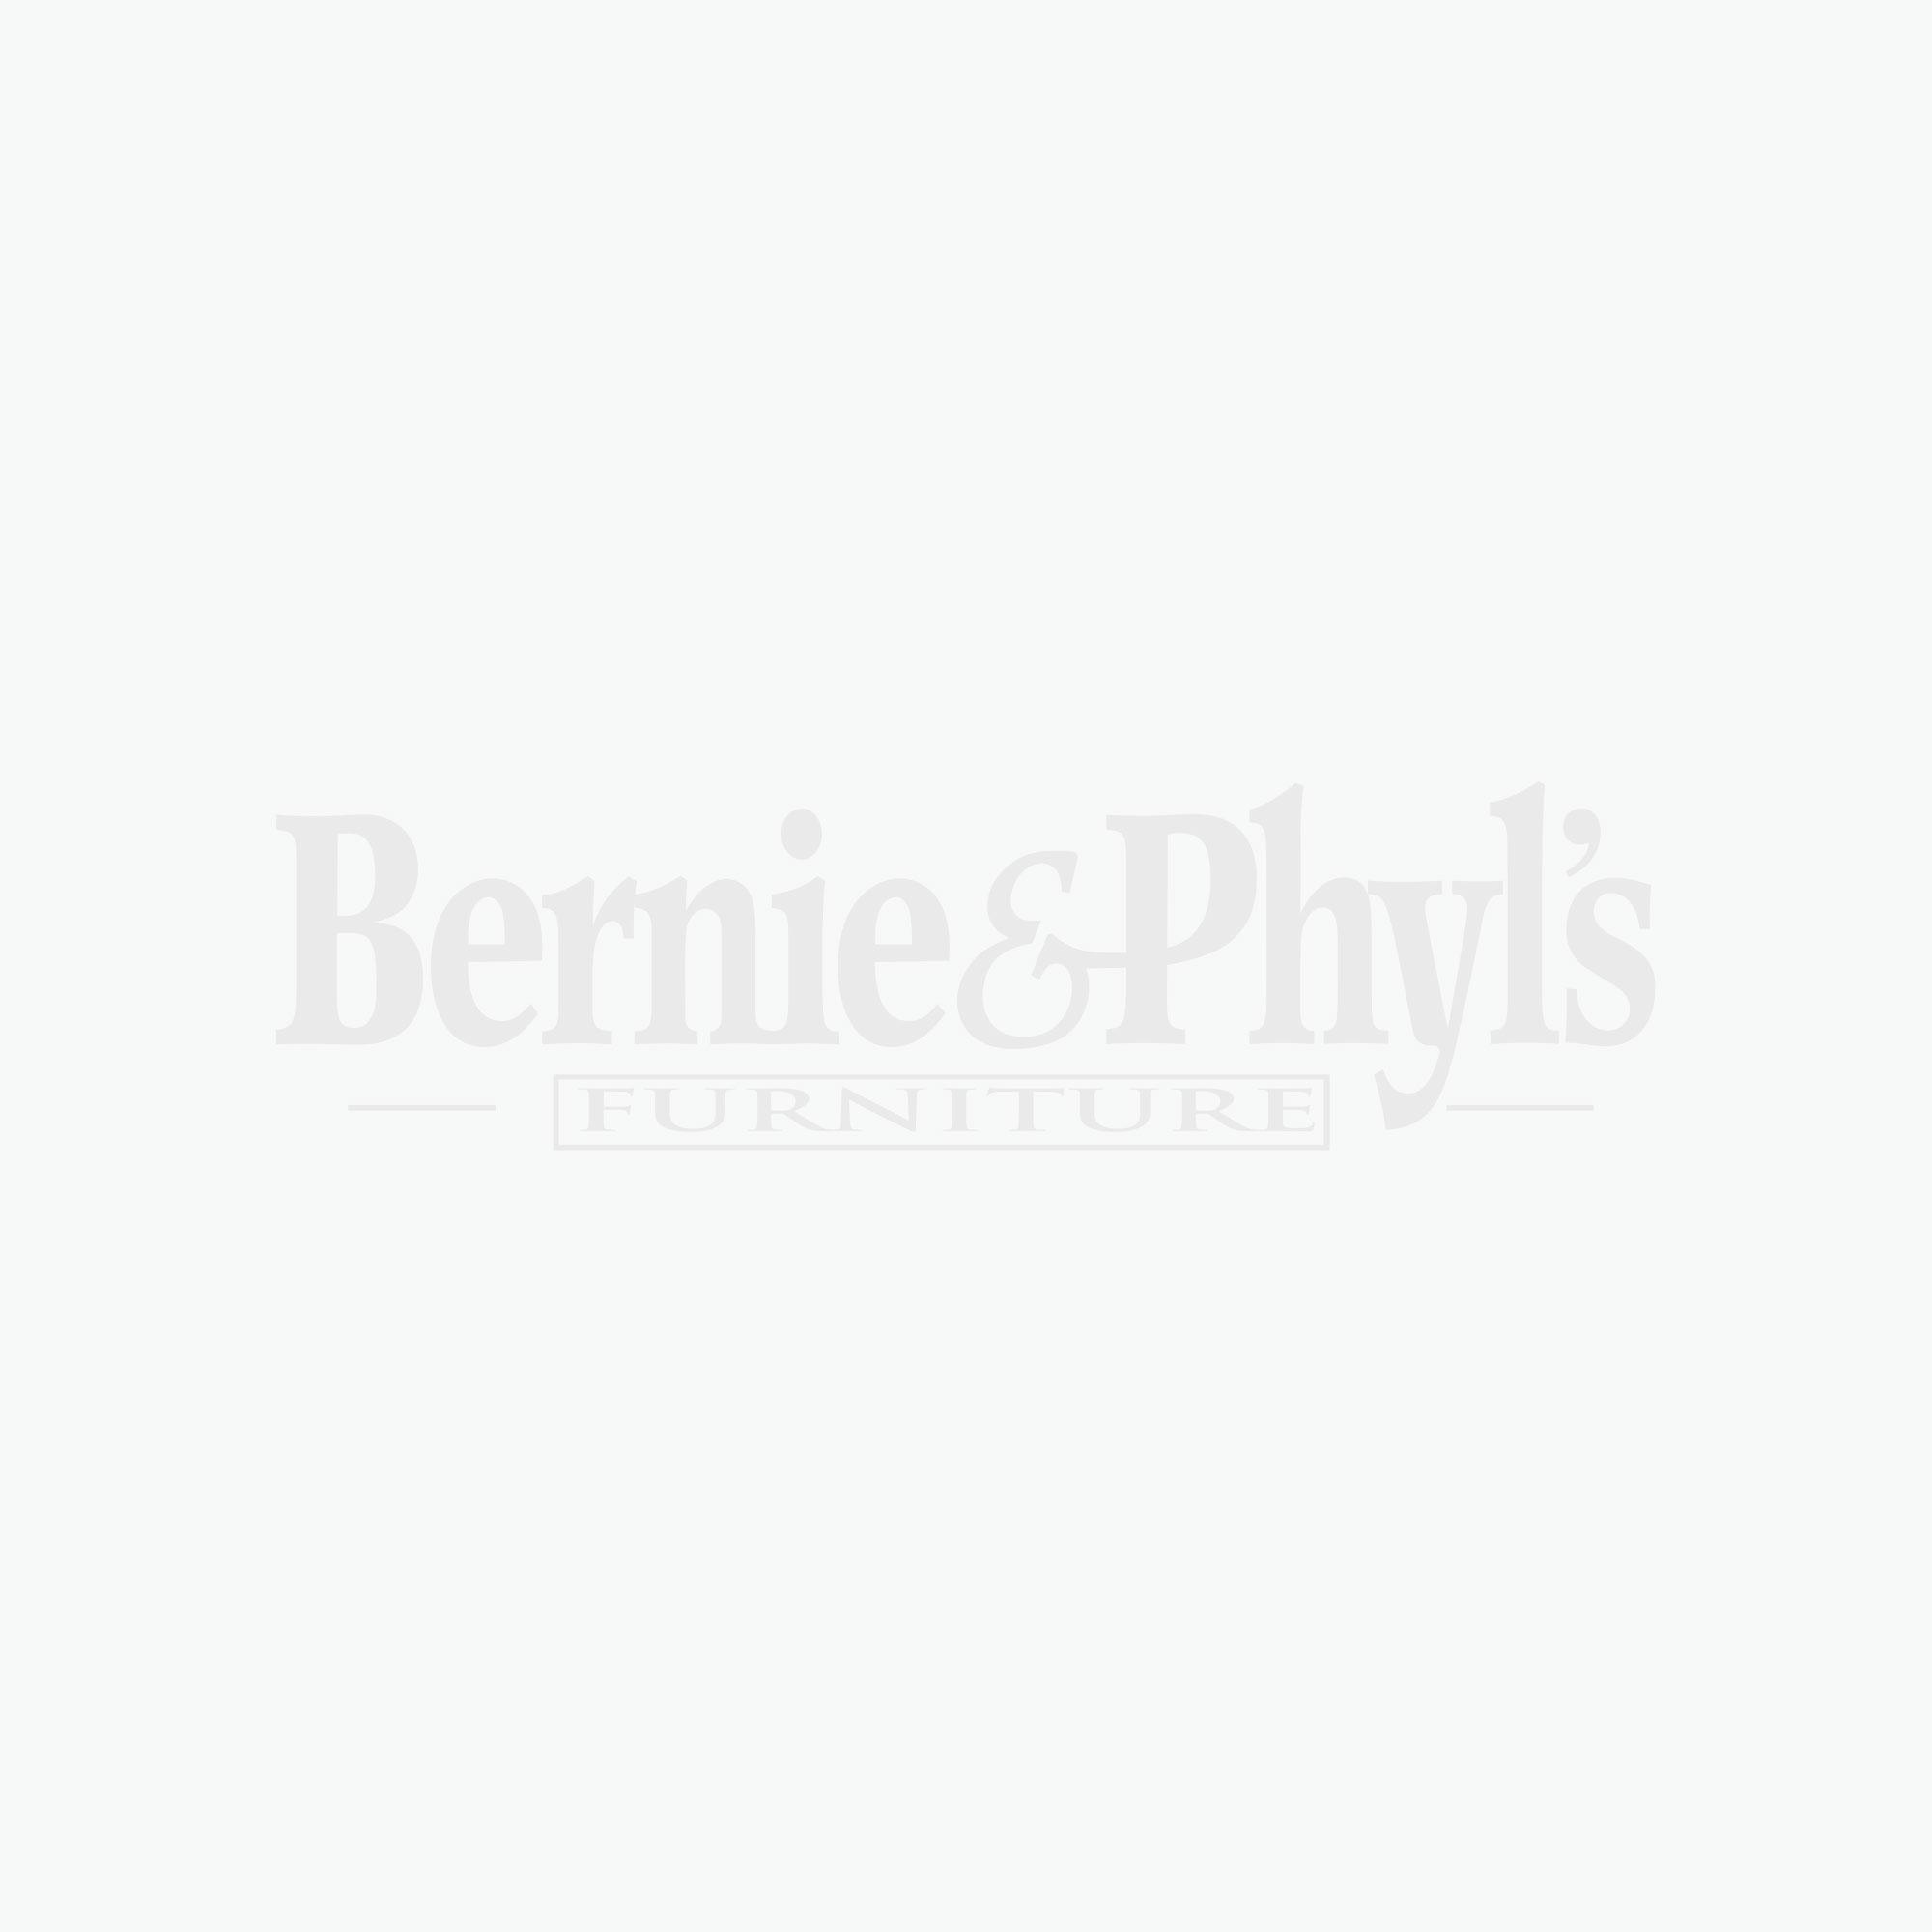 Boston Graffiti Dining Table Bernie & Phyl s Furniture by